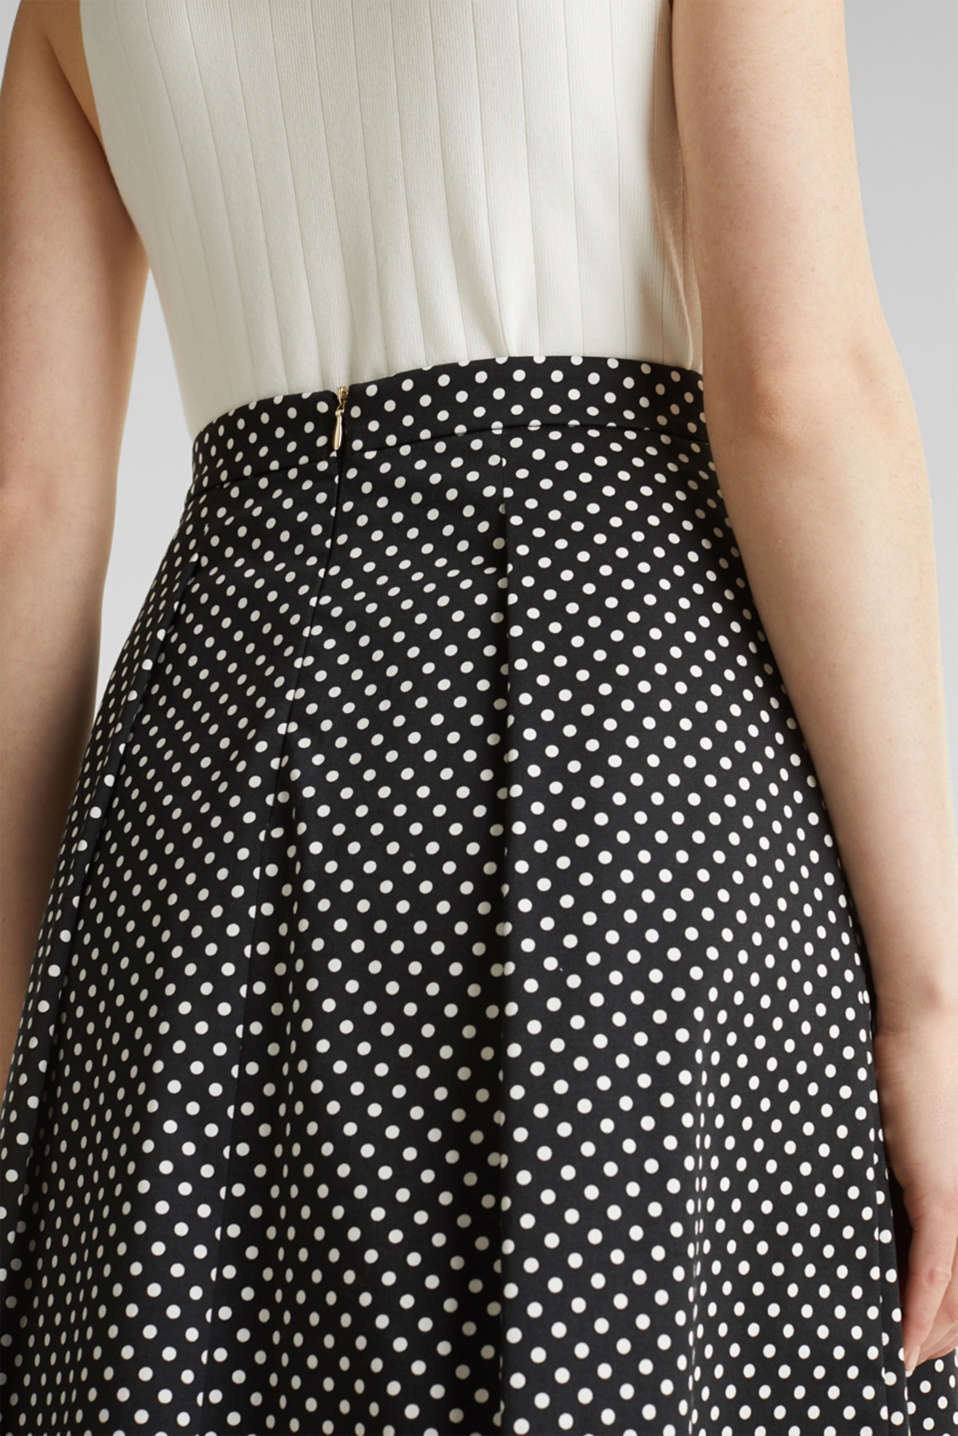 Satined polka dot skirt with stretch, BLACK 3, detail image number 2